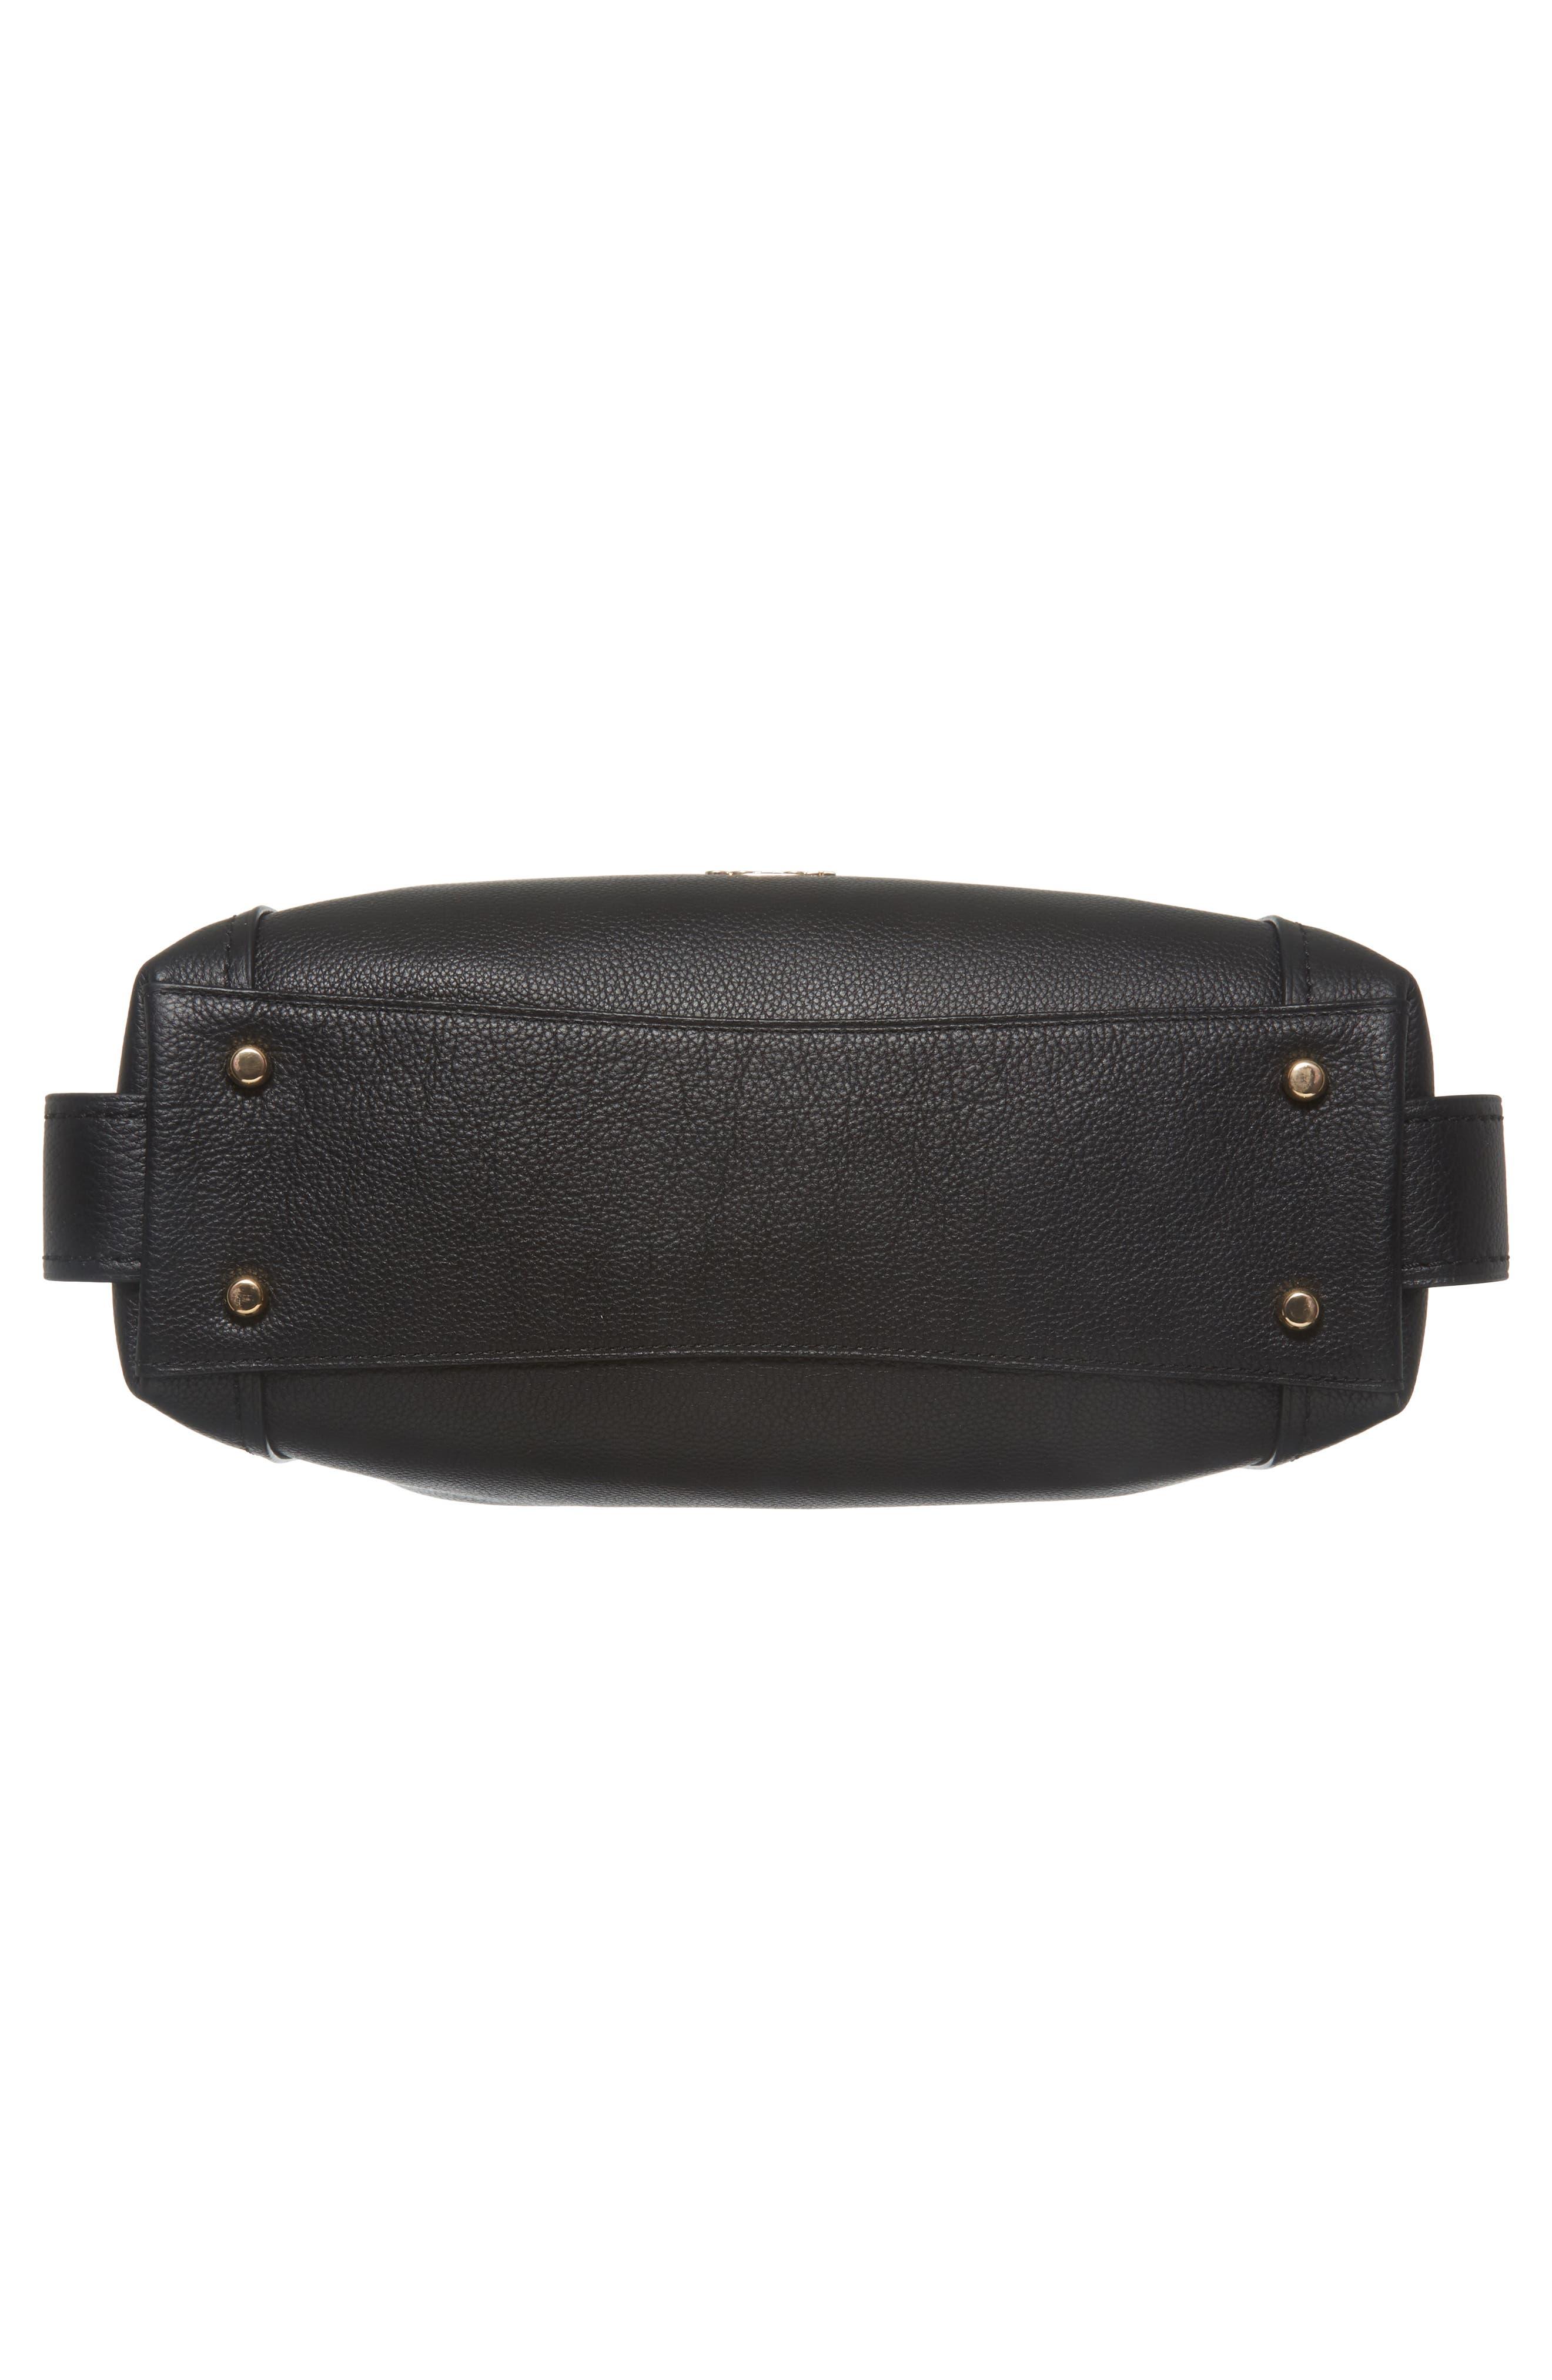 Edie 31 Pebbled Leather Shoulder Bag,                             Alternate thumbnail 6, color,                             BLACK